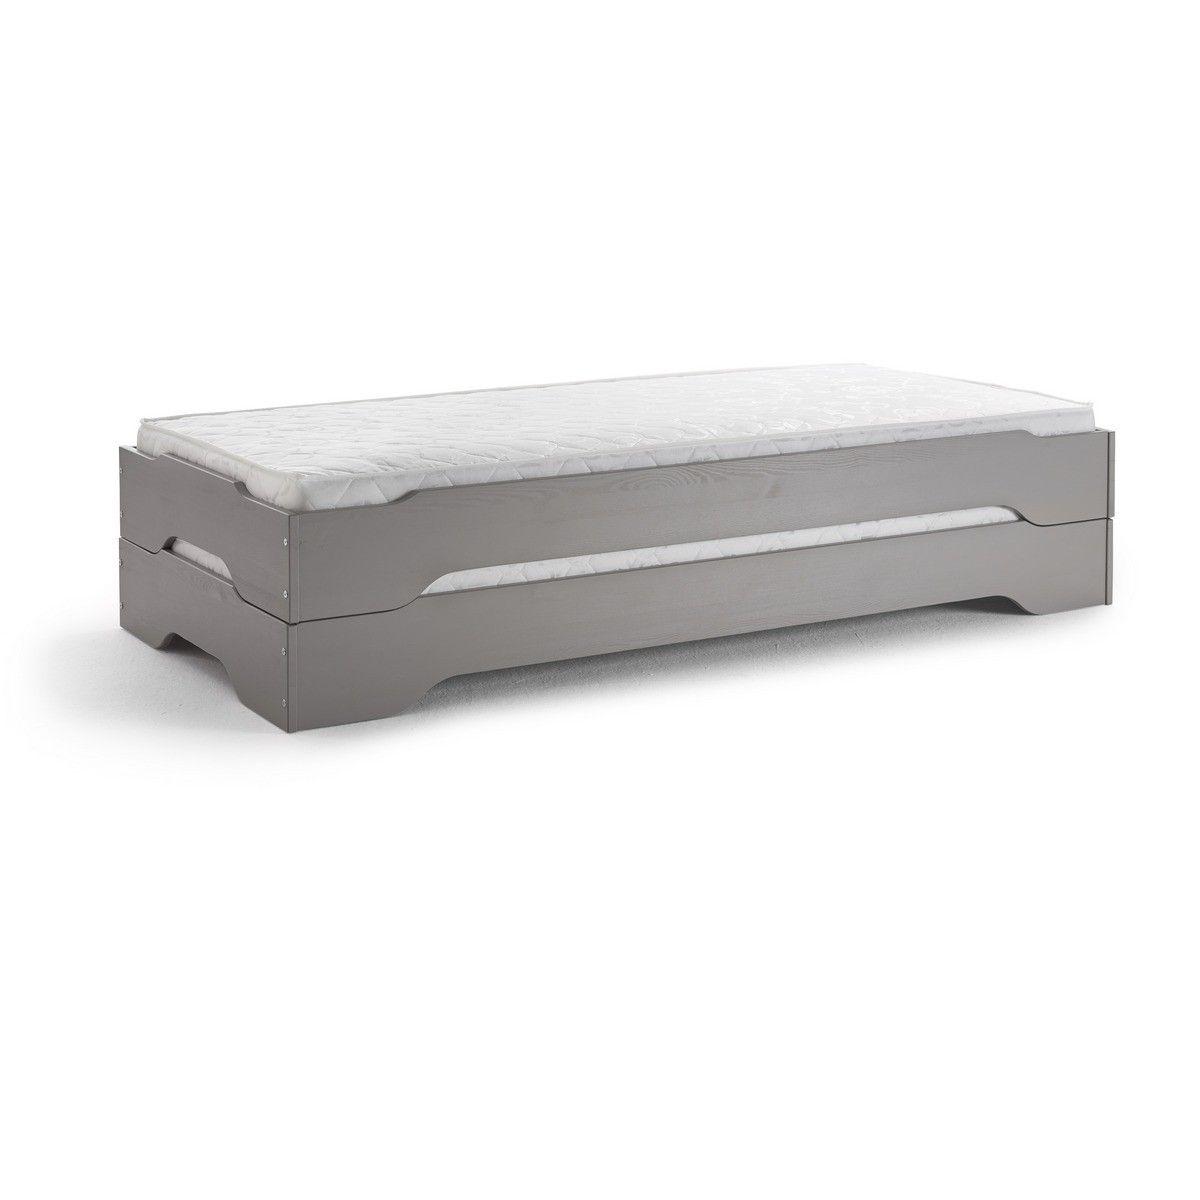 Stapelbett Gastebett 2x Betten 90x200 Kiefer Taupe Grau Lackiert